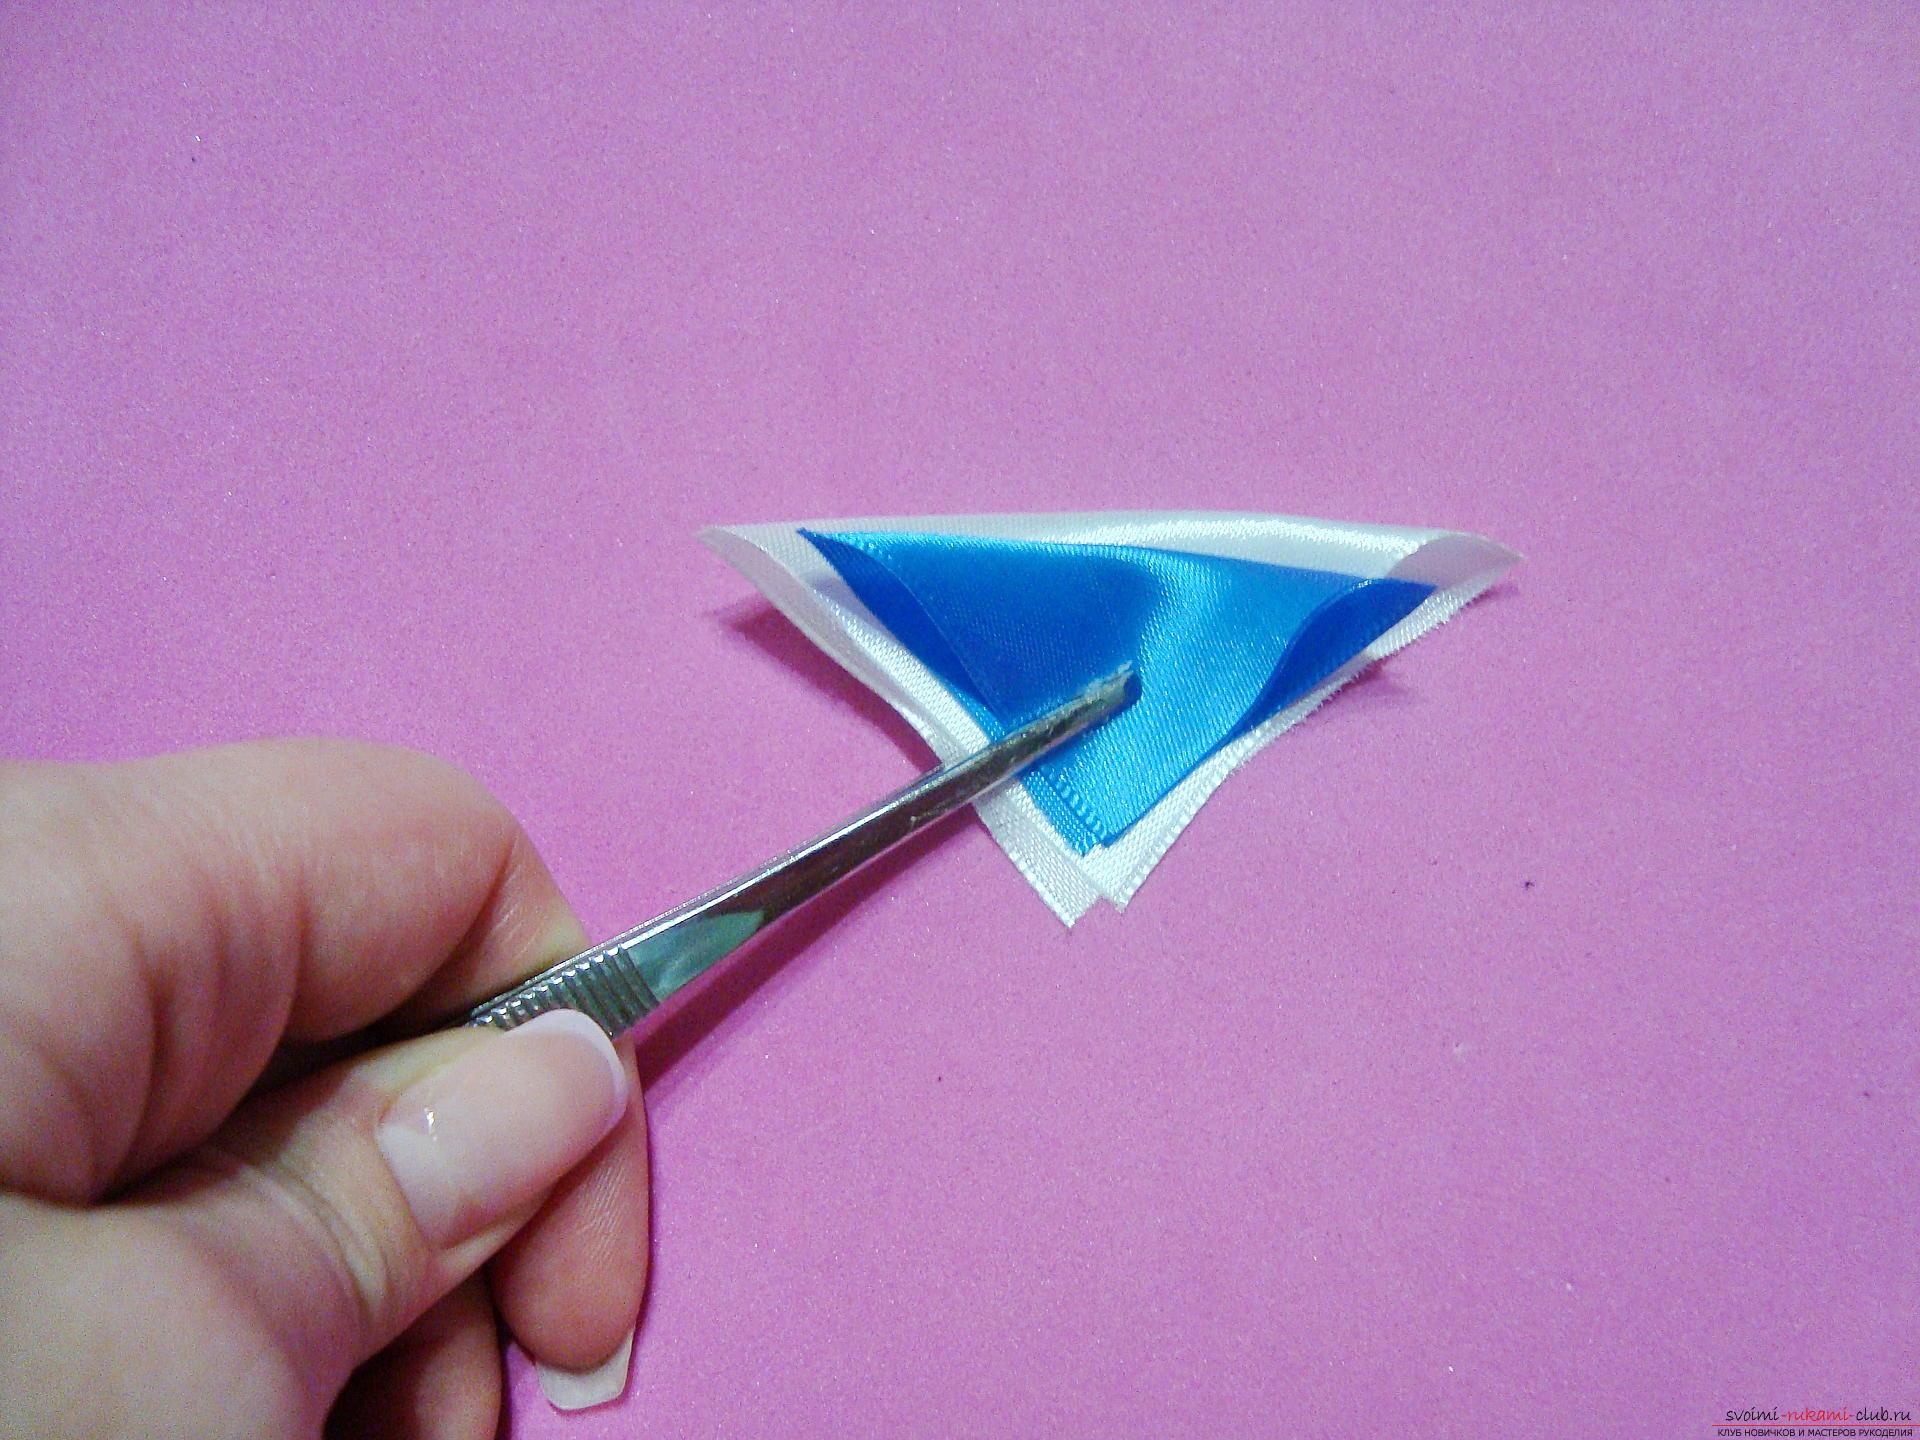 Фото инструкция по изготовлению заколки из лент голубого цвета в технике канзаши. Фото №5